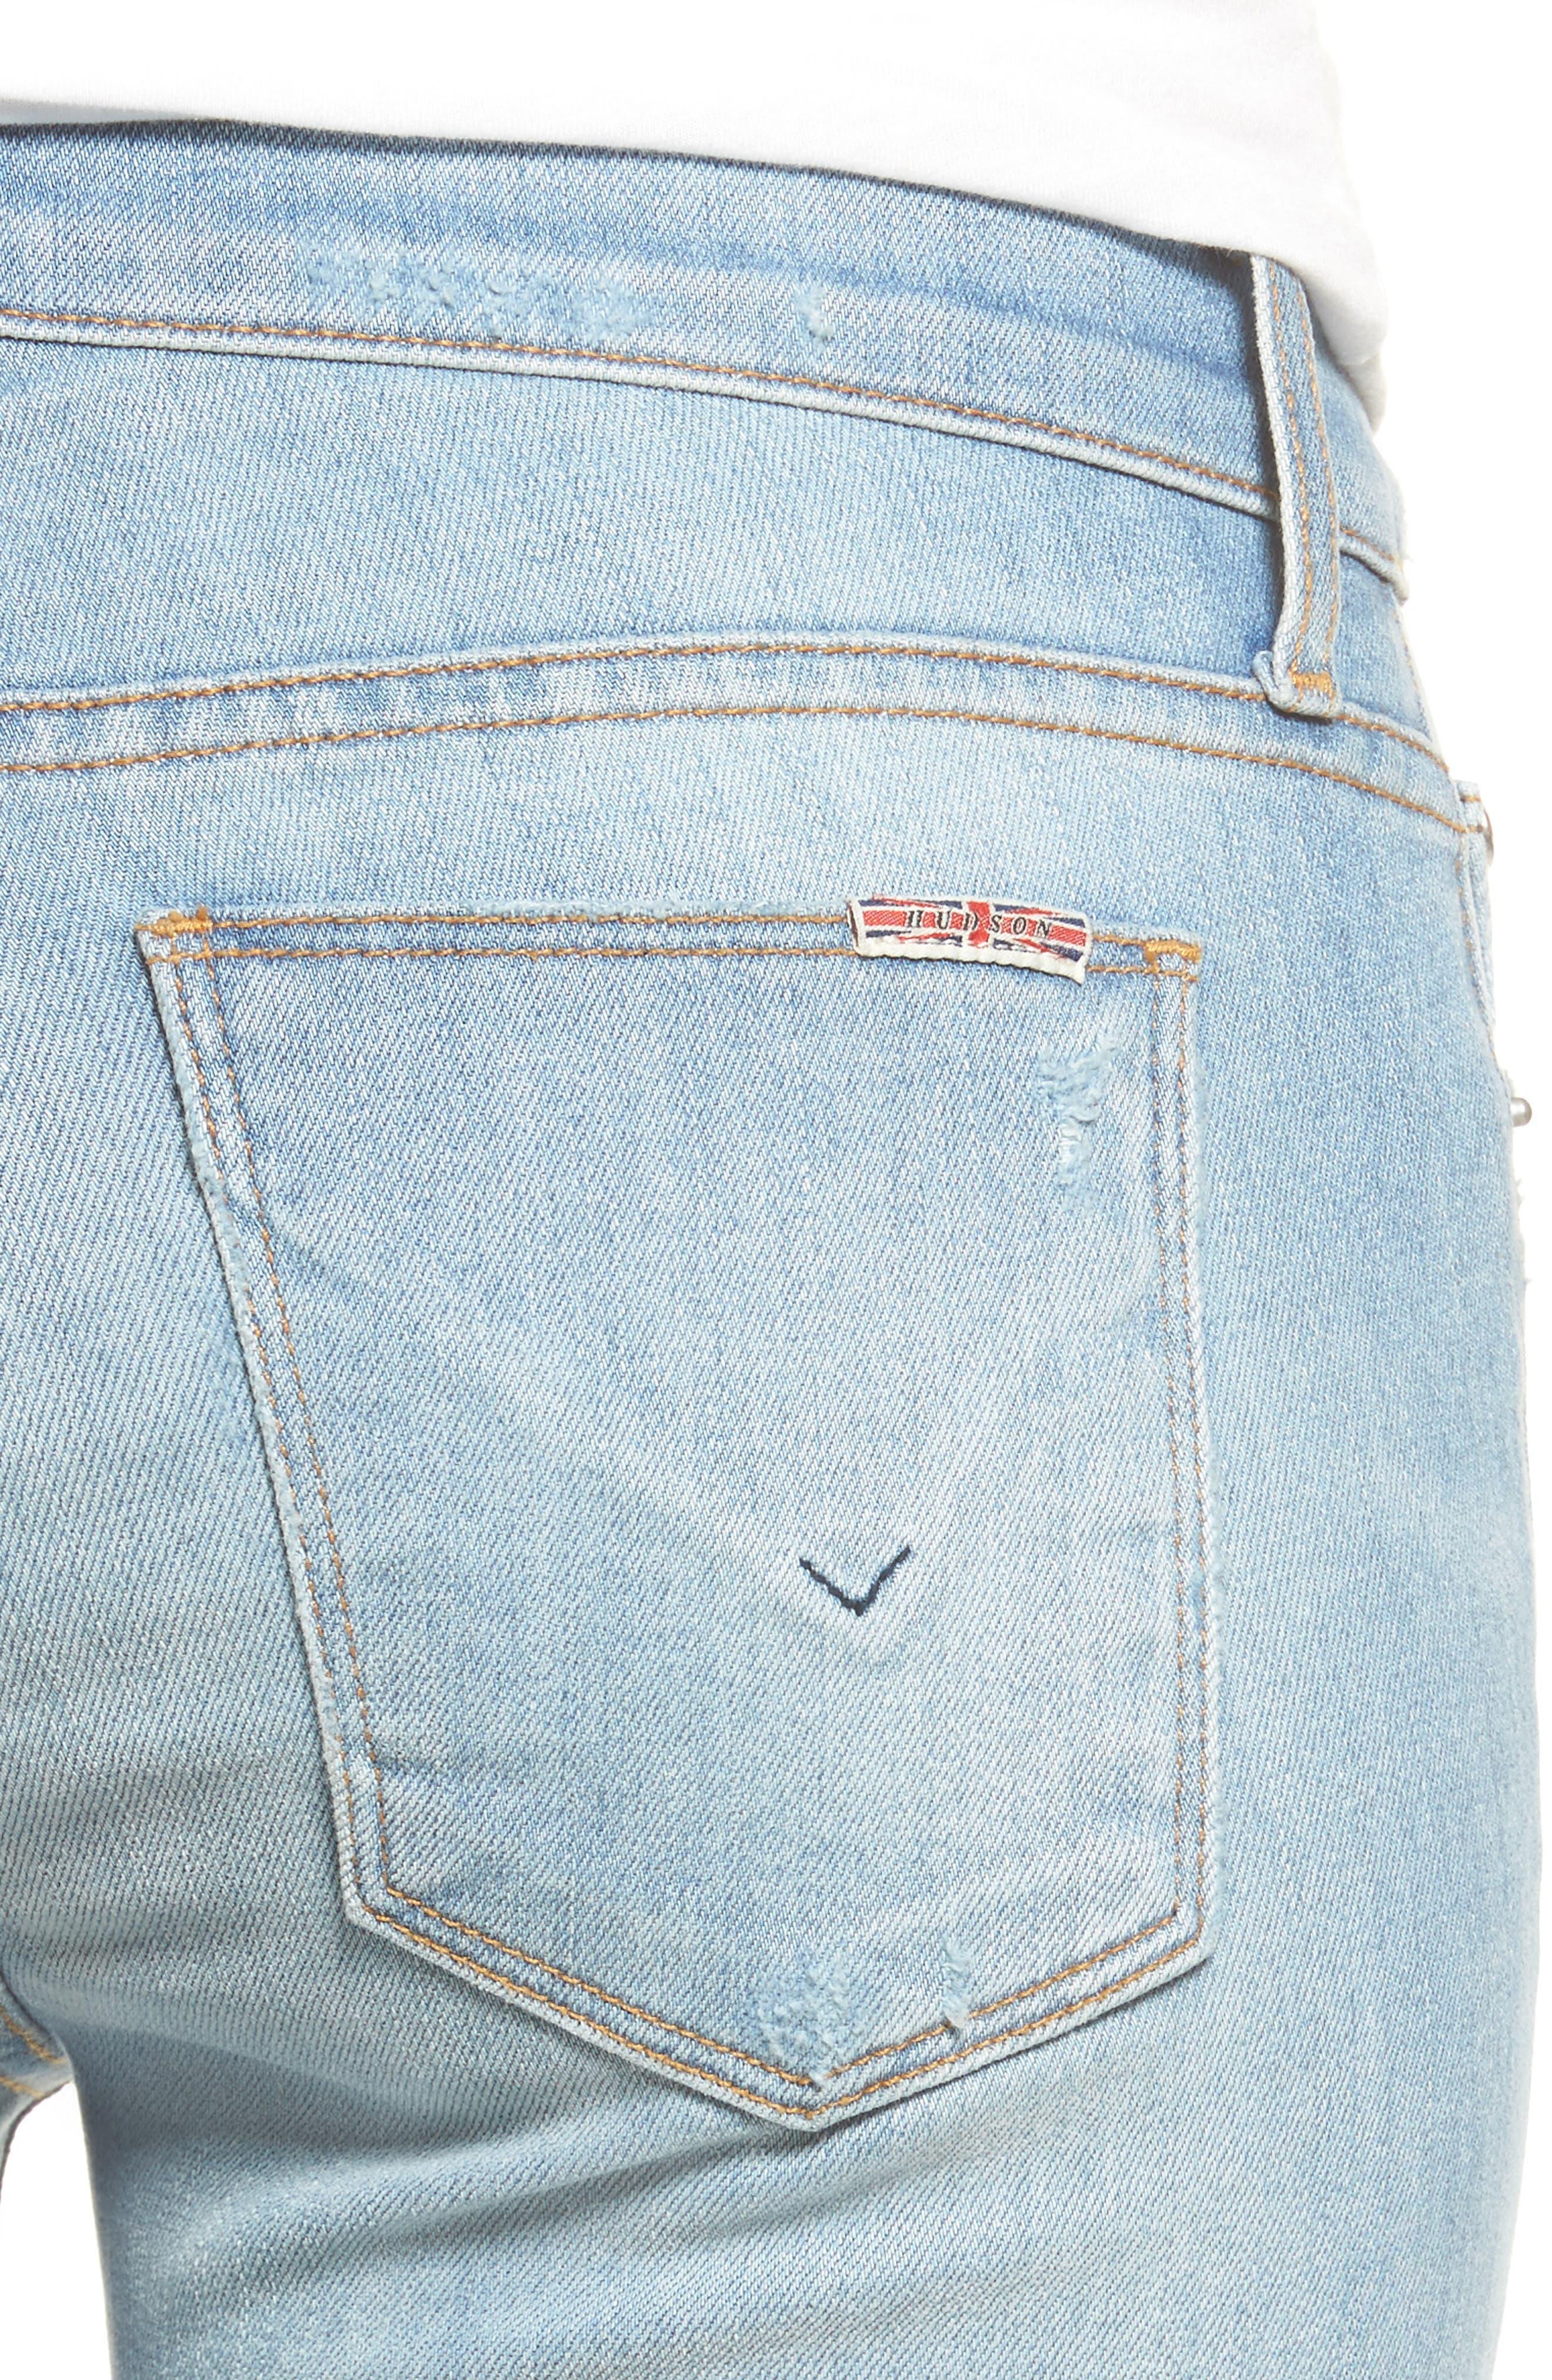 Krista Ankle Super Skinny Jeans,                             Alternate thumbnail 9, color,